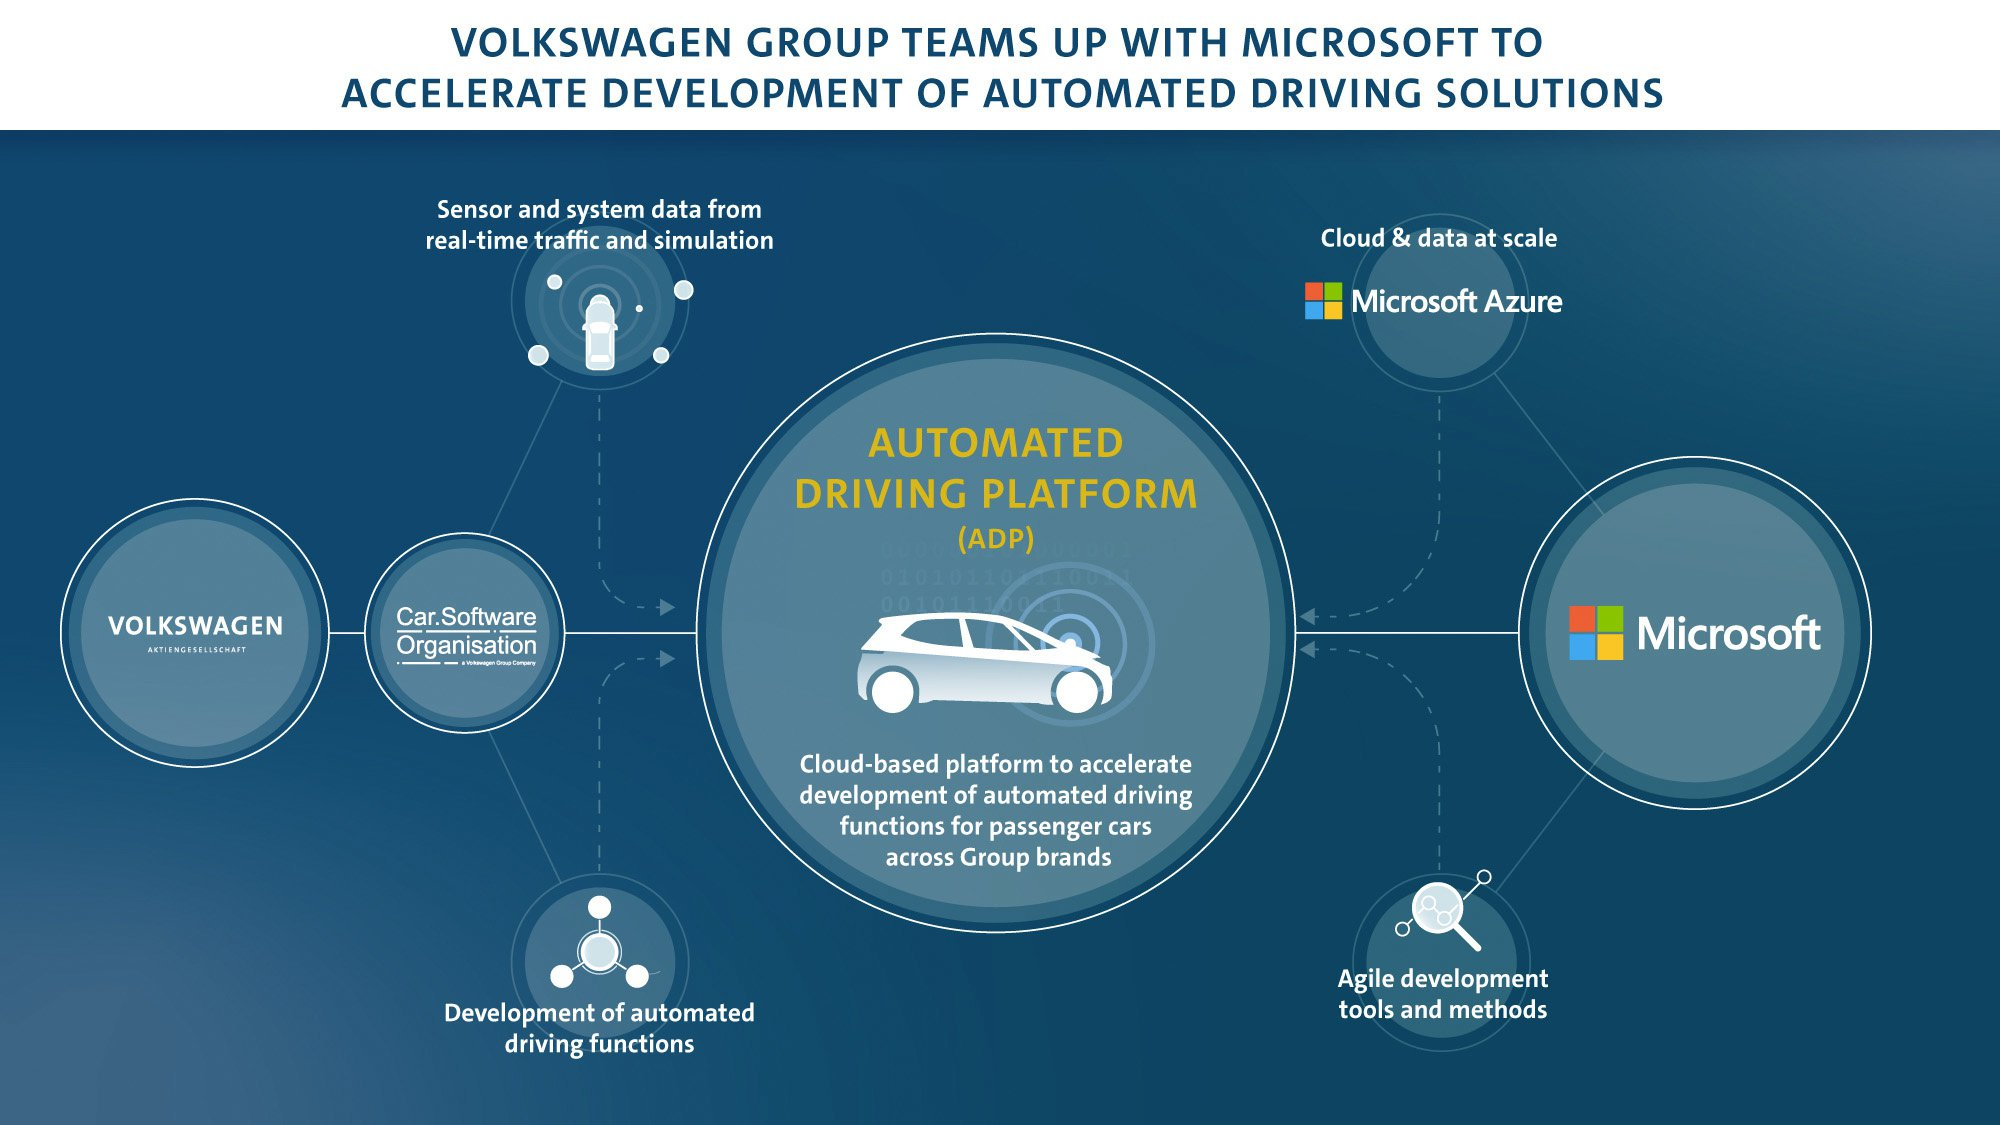 VW and Microsoft